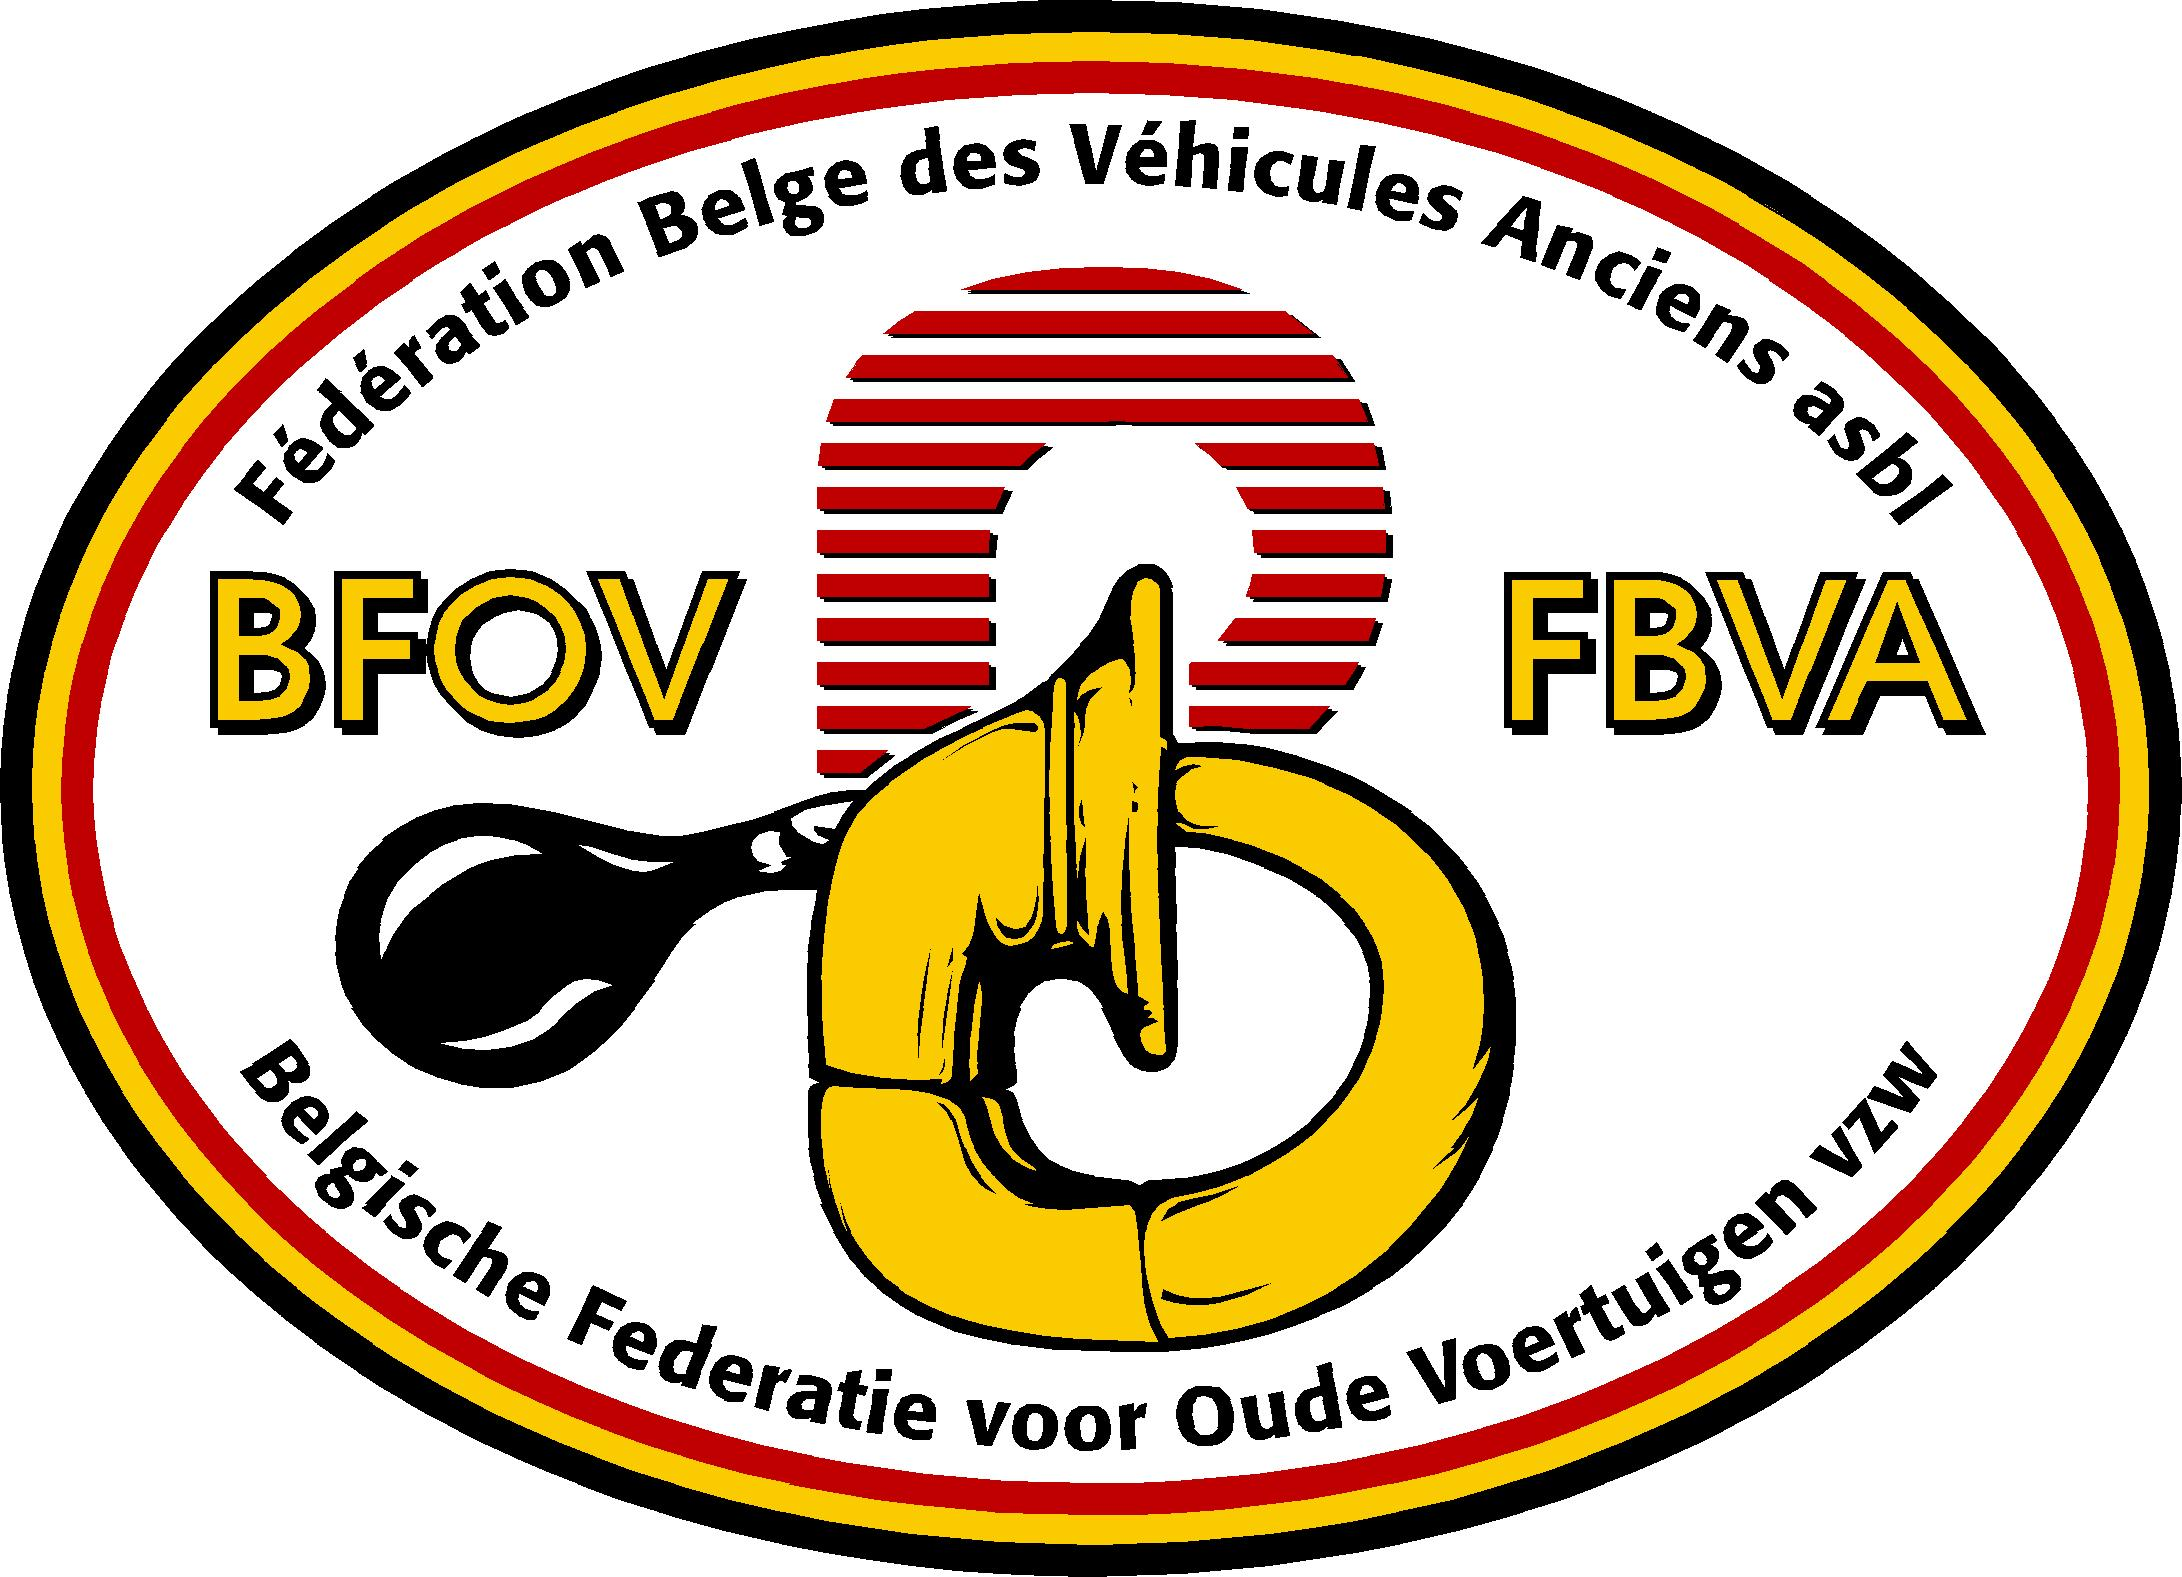 FBVA-BFOVpms